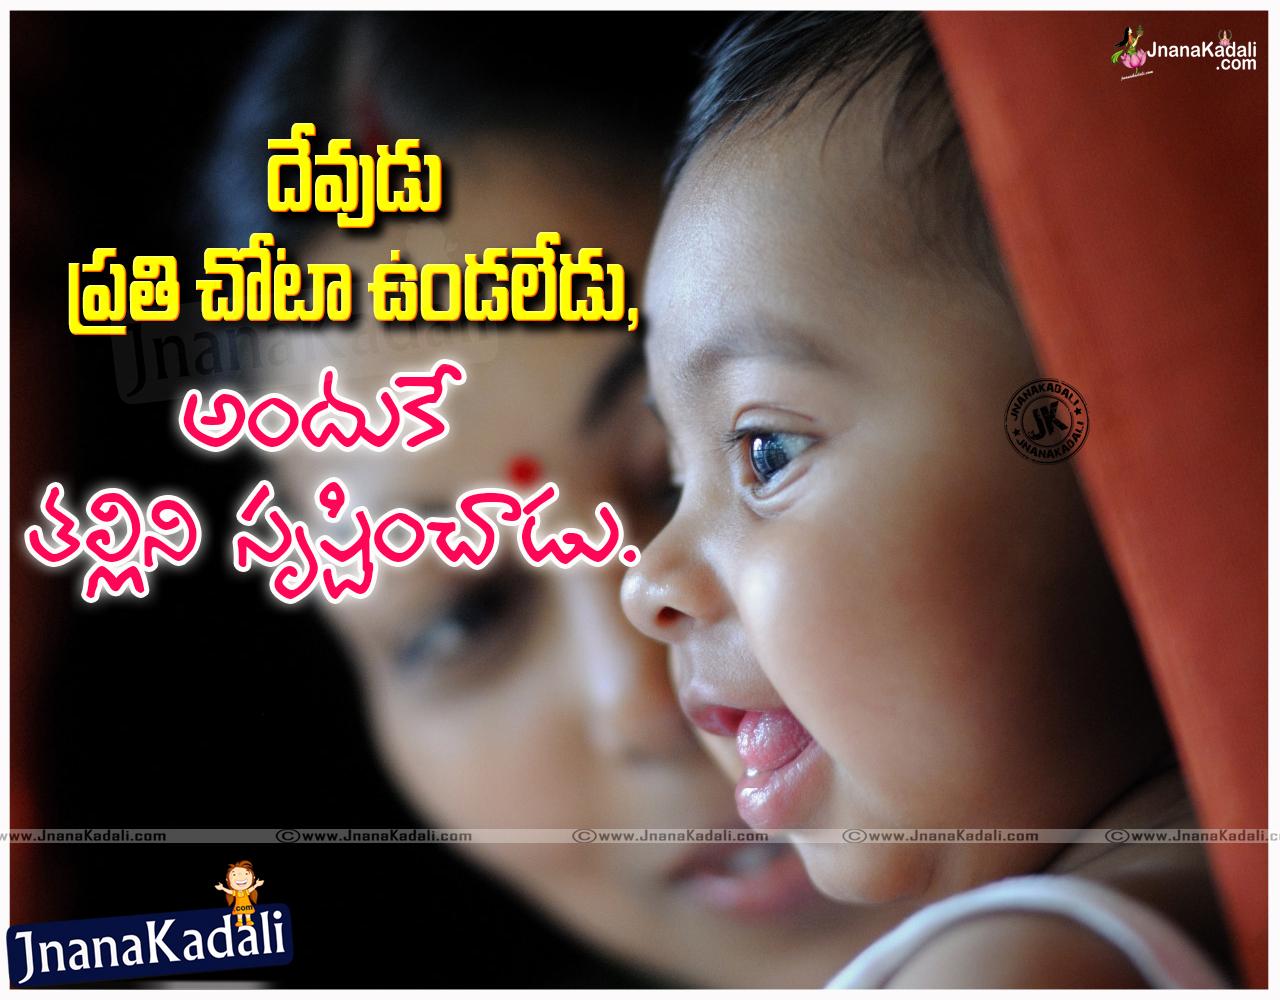 Amma Quotes In English Amma Kavitalu Nanna Kavitalu Telugulo